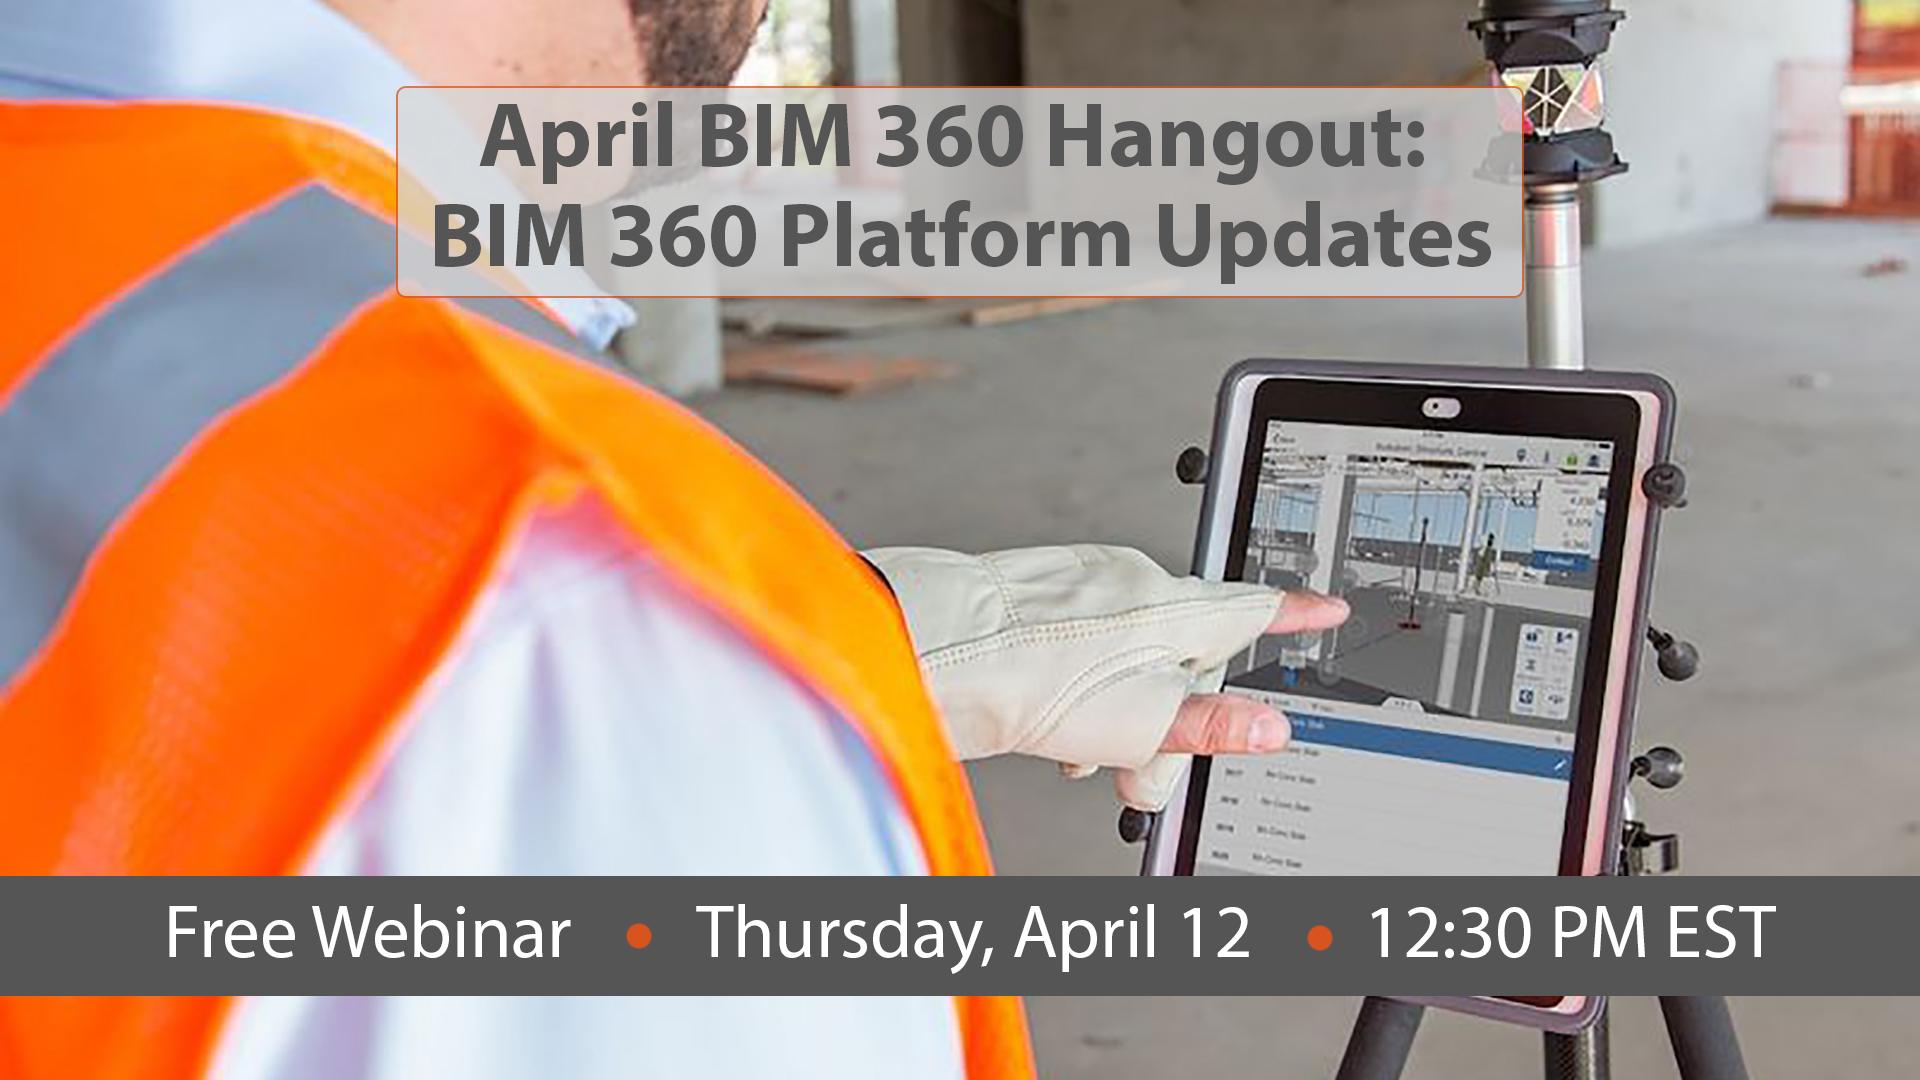 April BIM 360 Hangout: BIM 360 Platform Updates